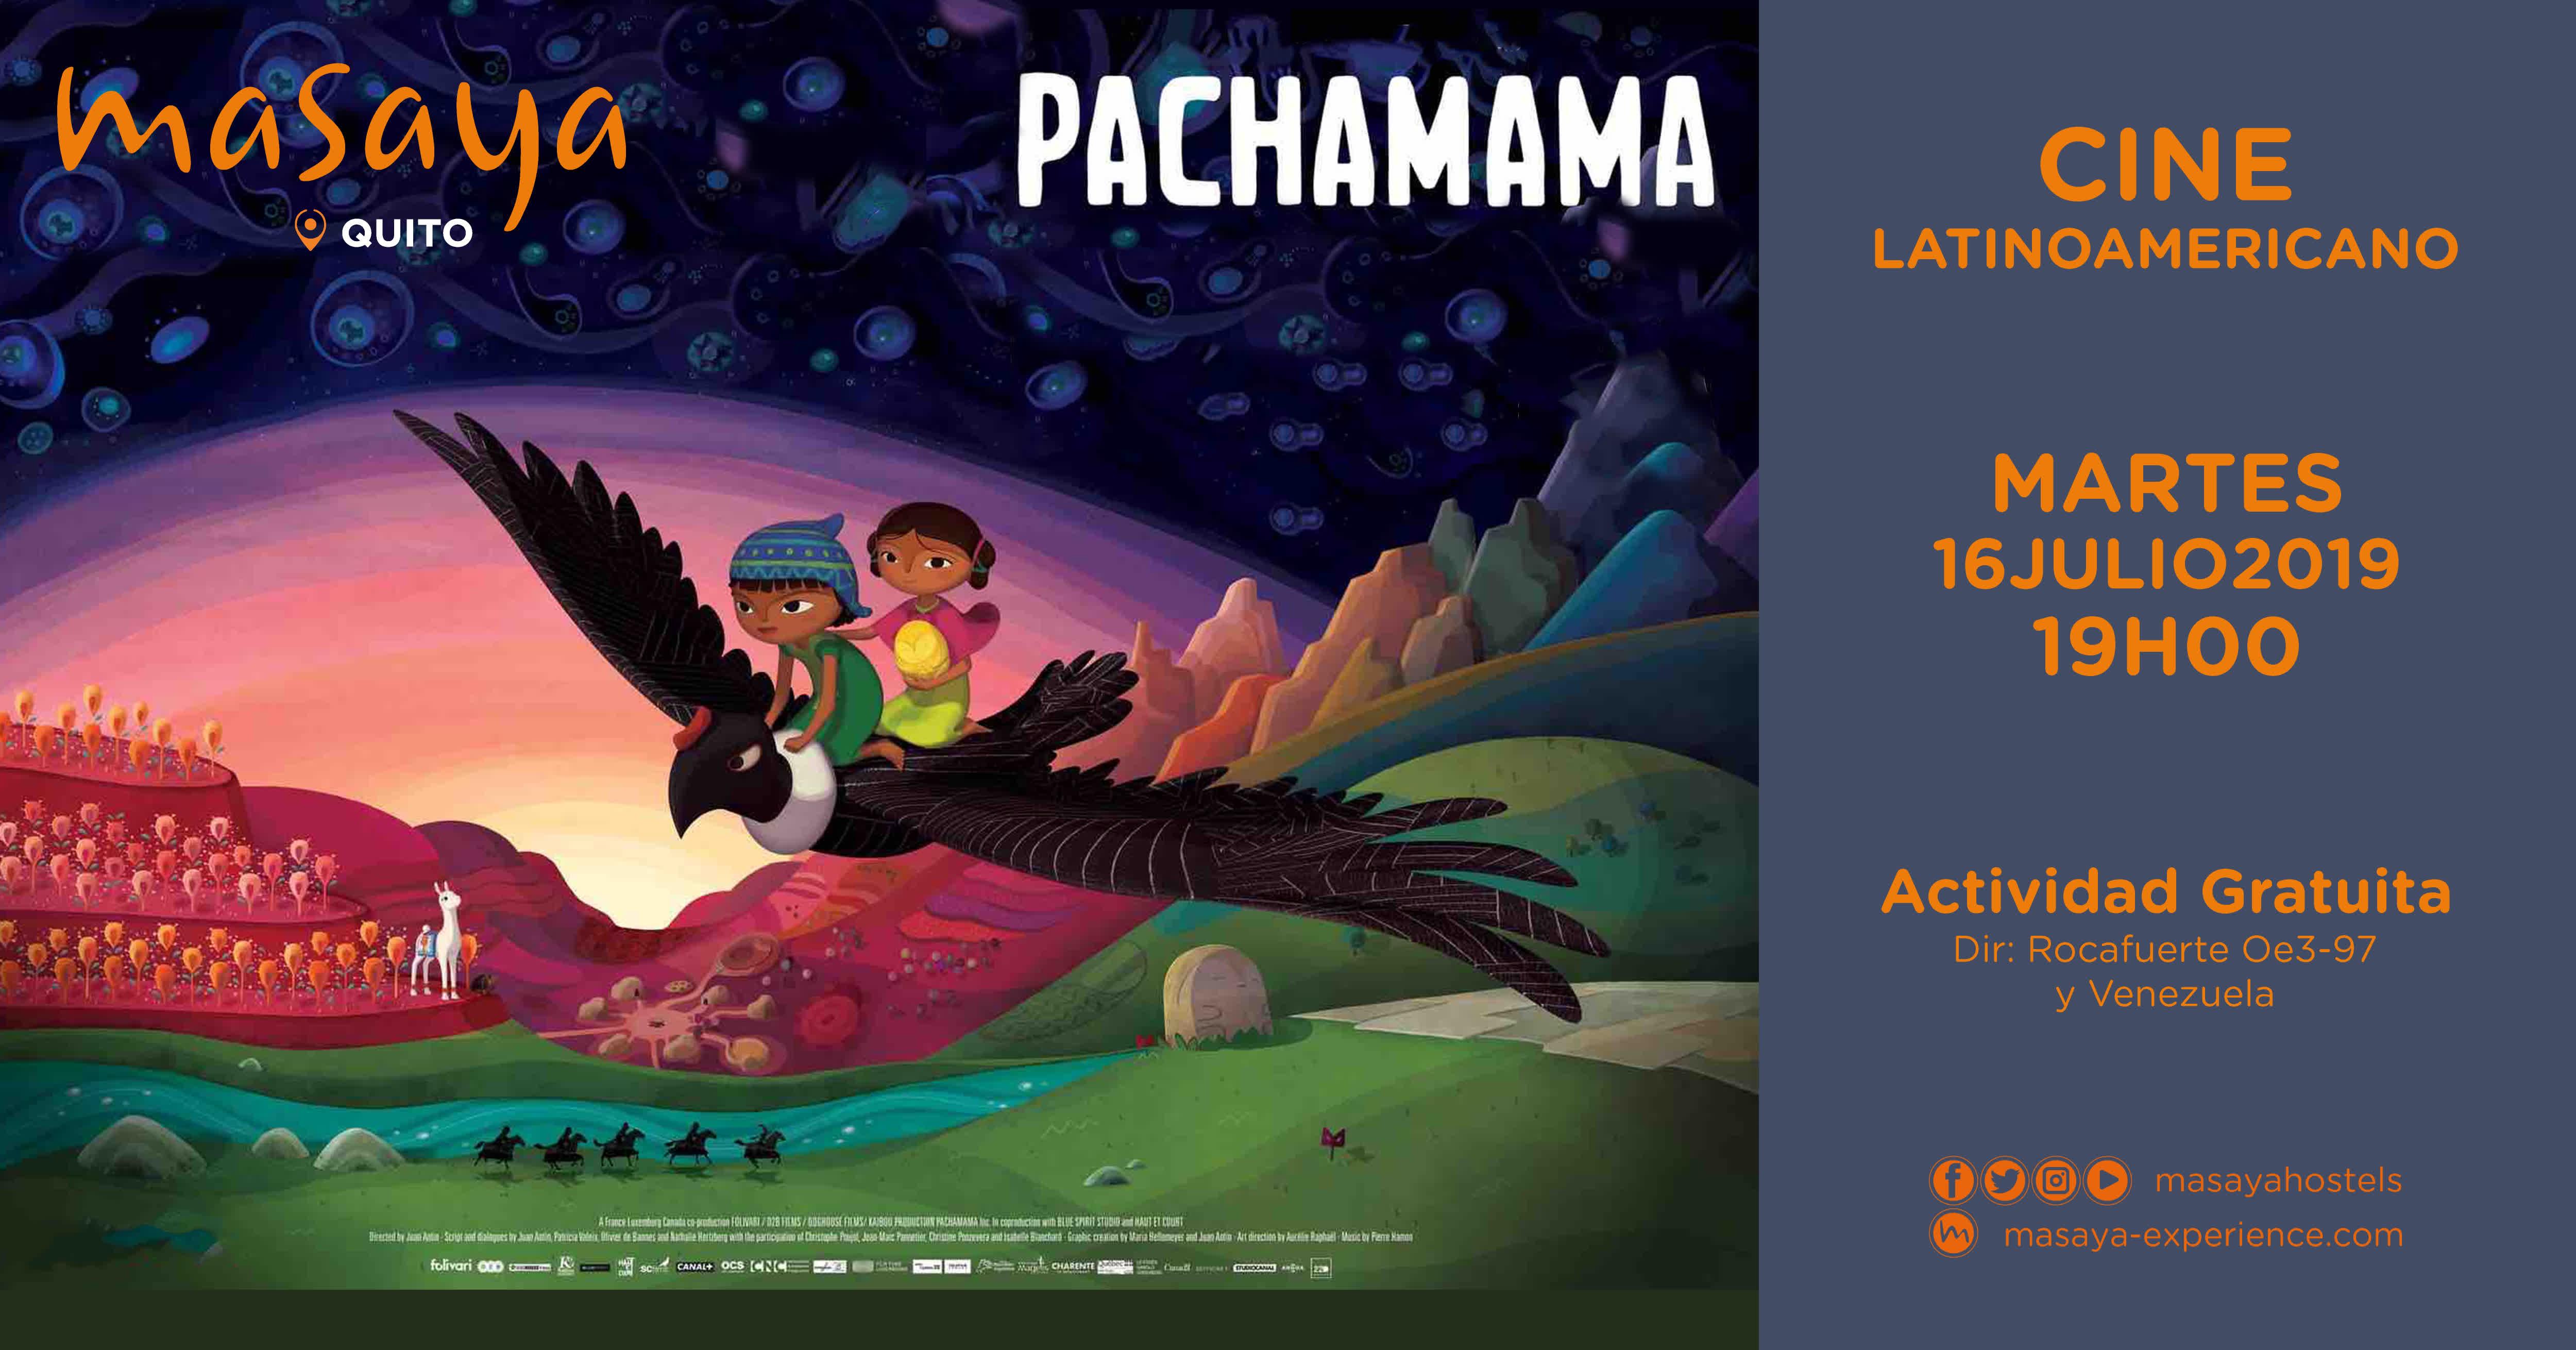 Cine Latinoamericano - Pachamama en Quito, BuenPlan